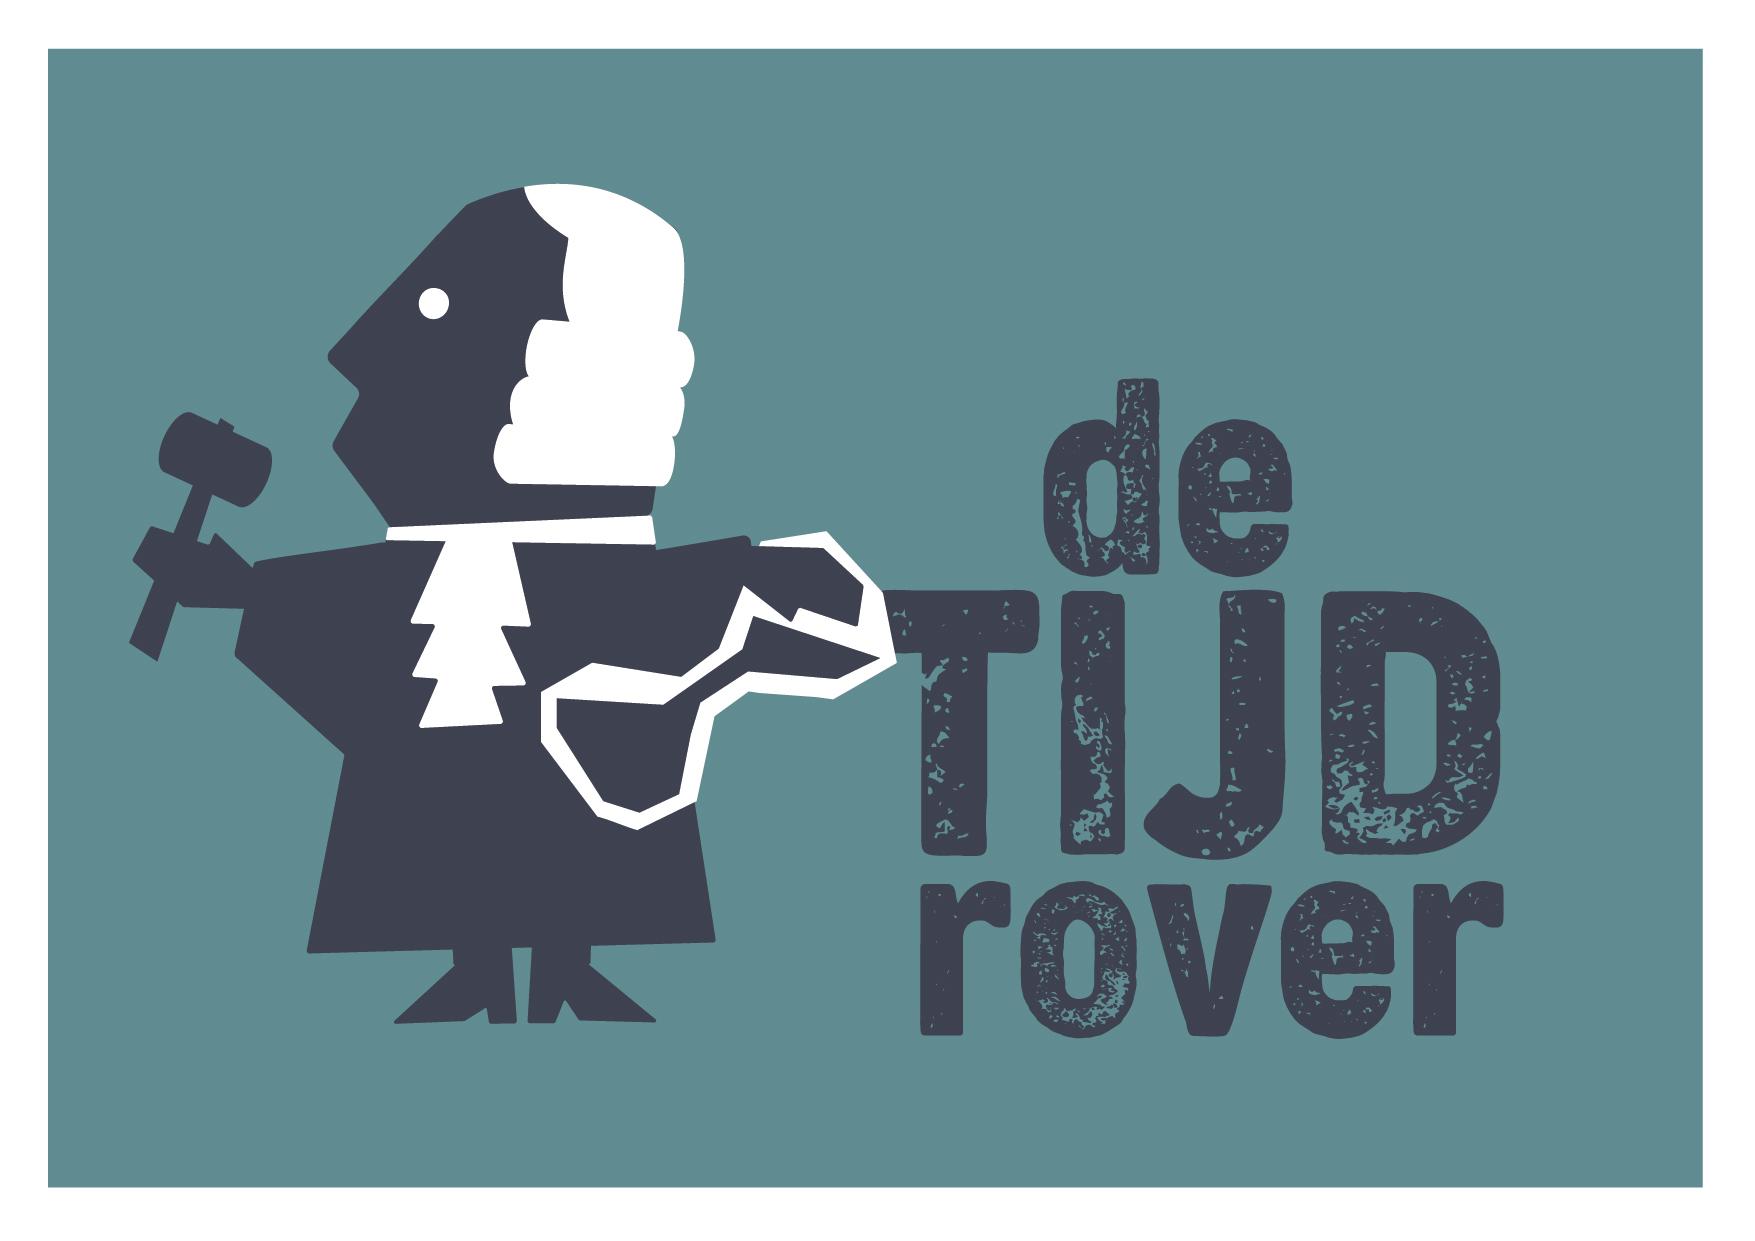 TijdRover_karakter_2_web